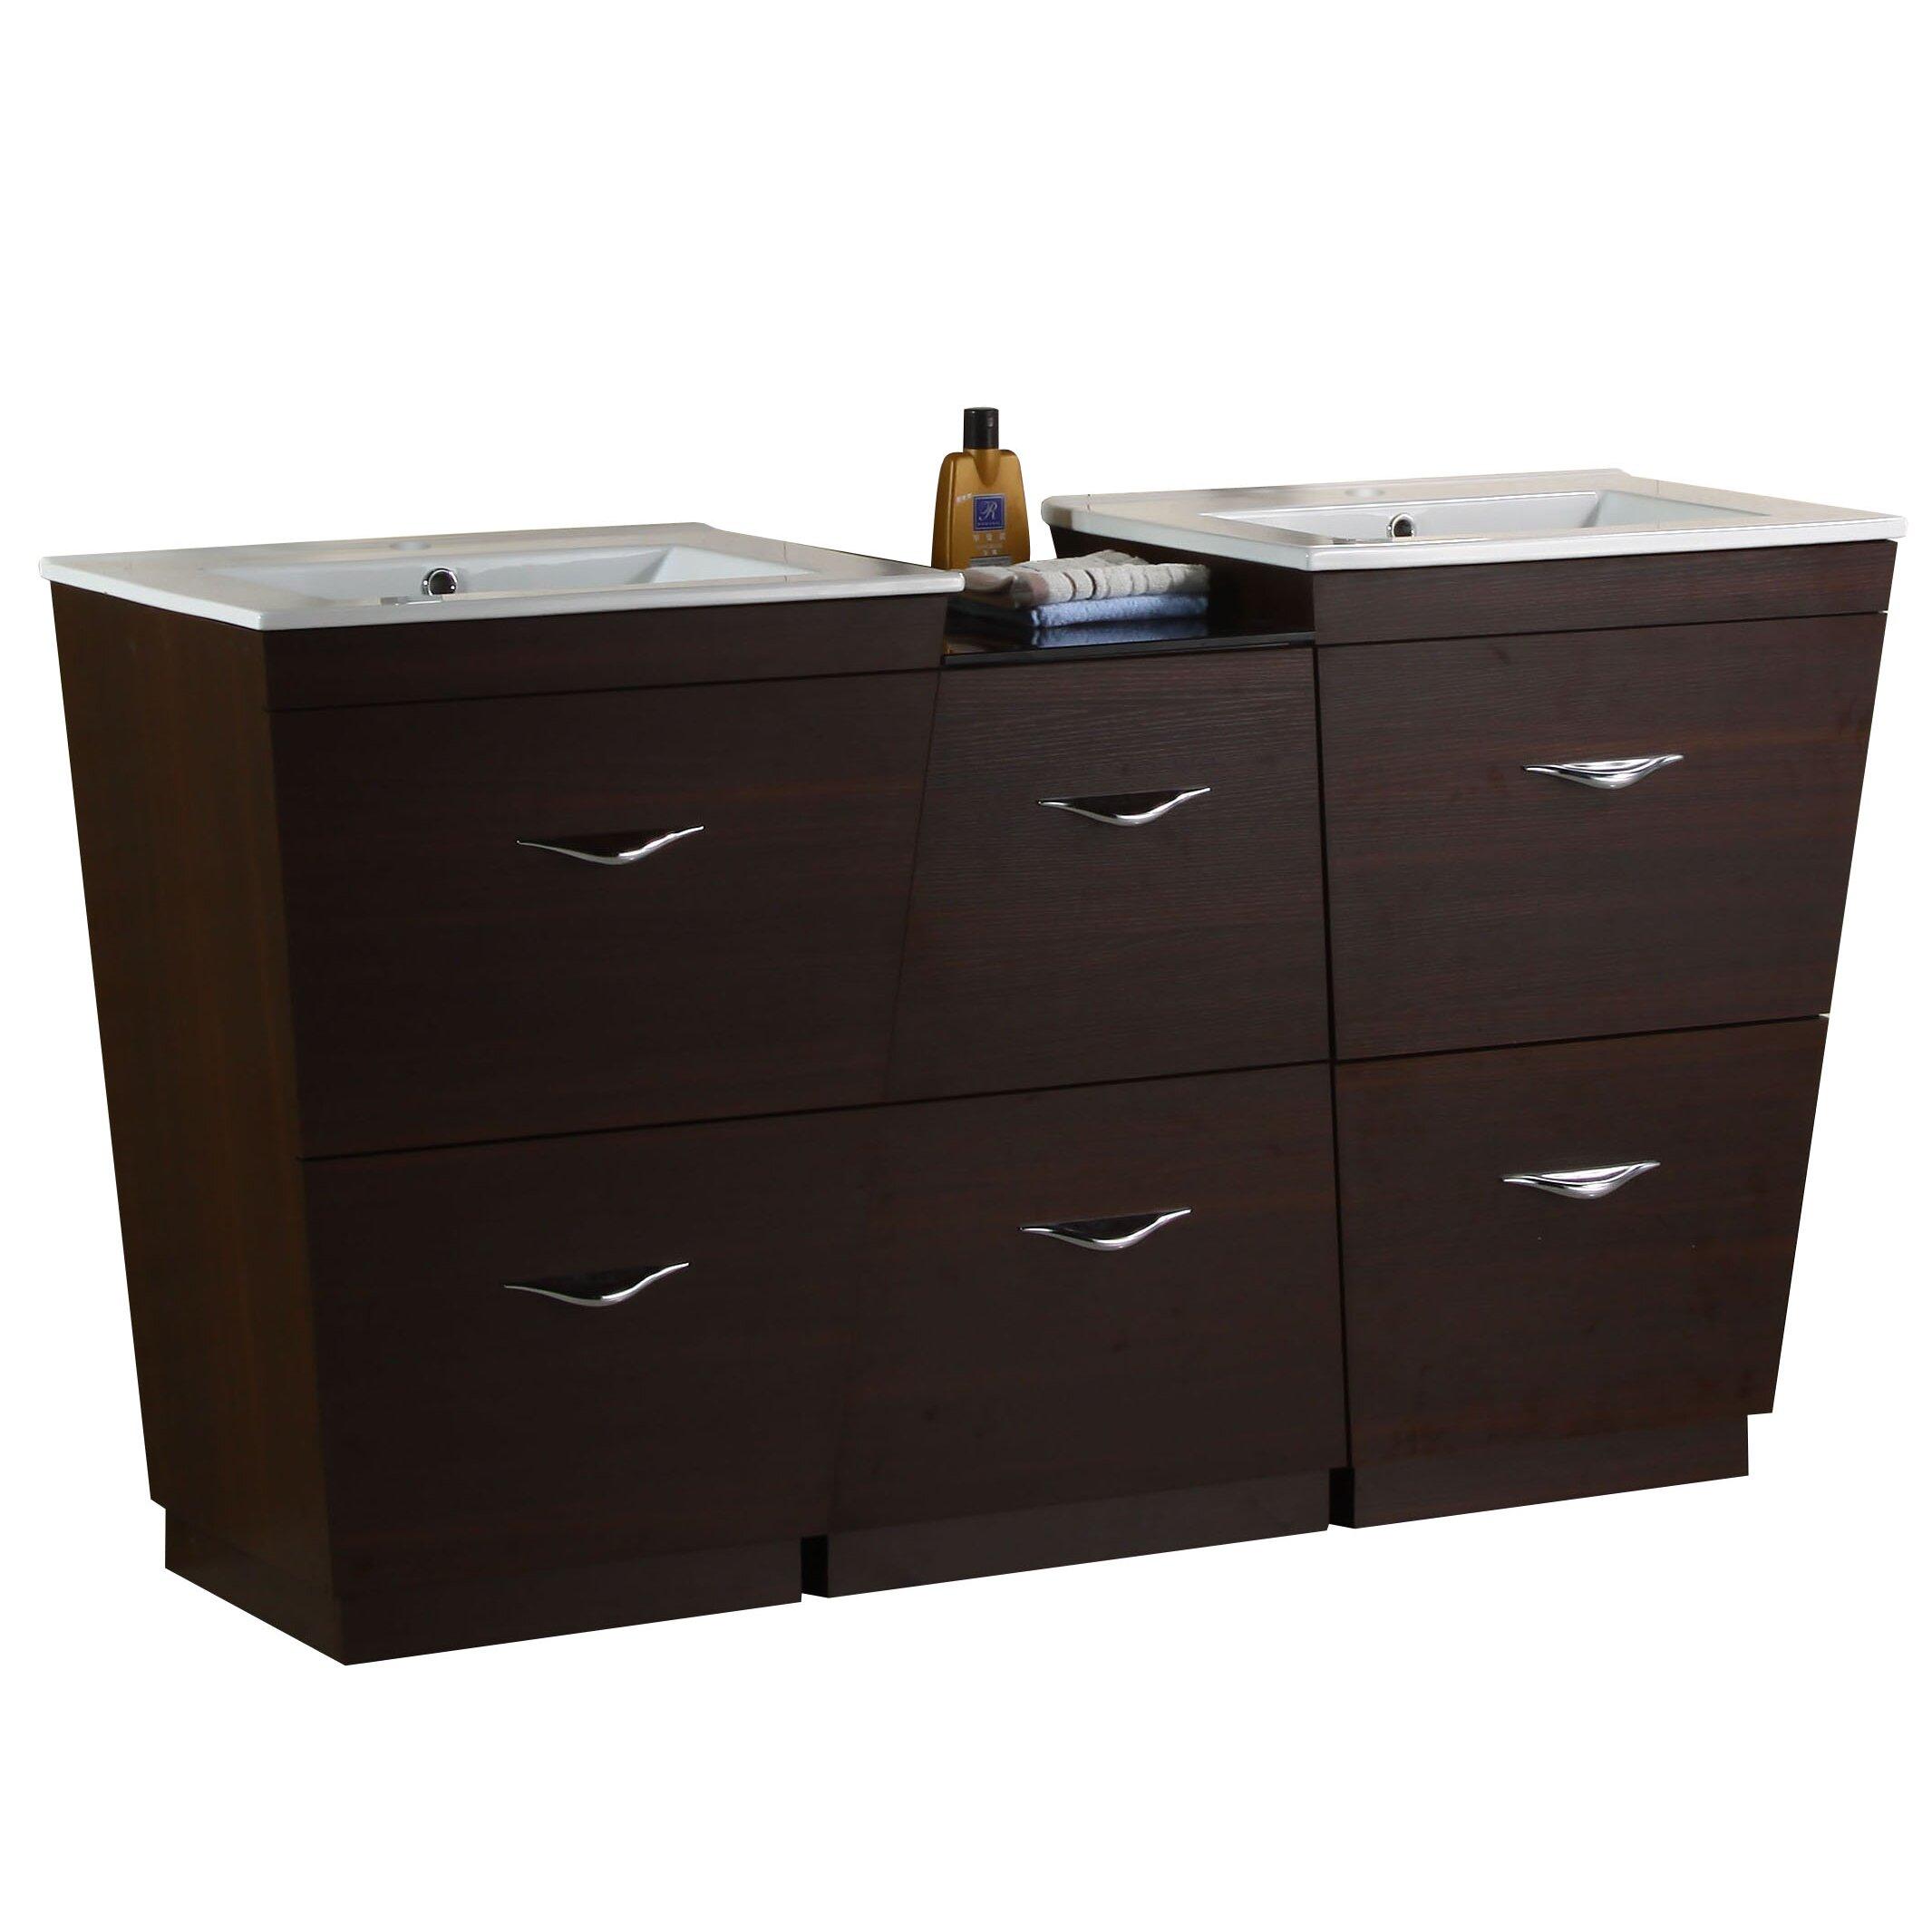 American imaginations 67 5 double modern bathroom vanity for Levi 29 5 single modern bathroom vanity set